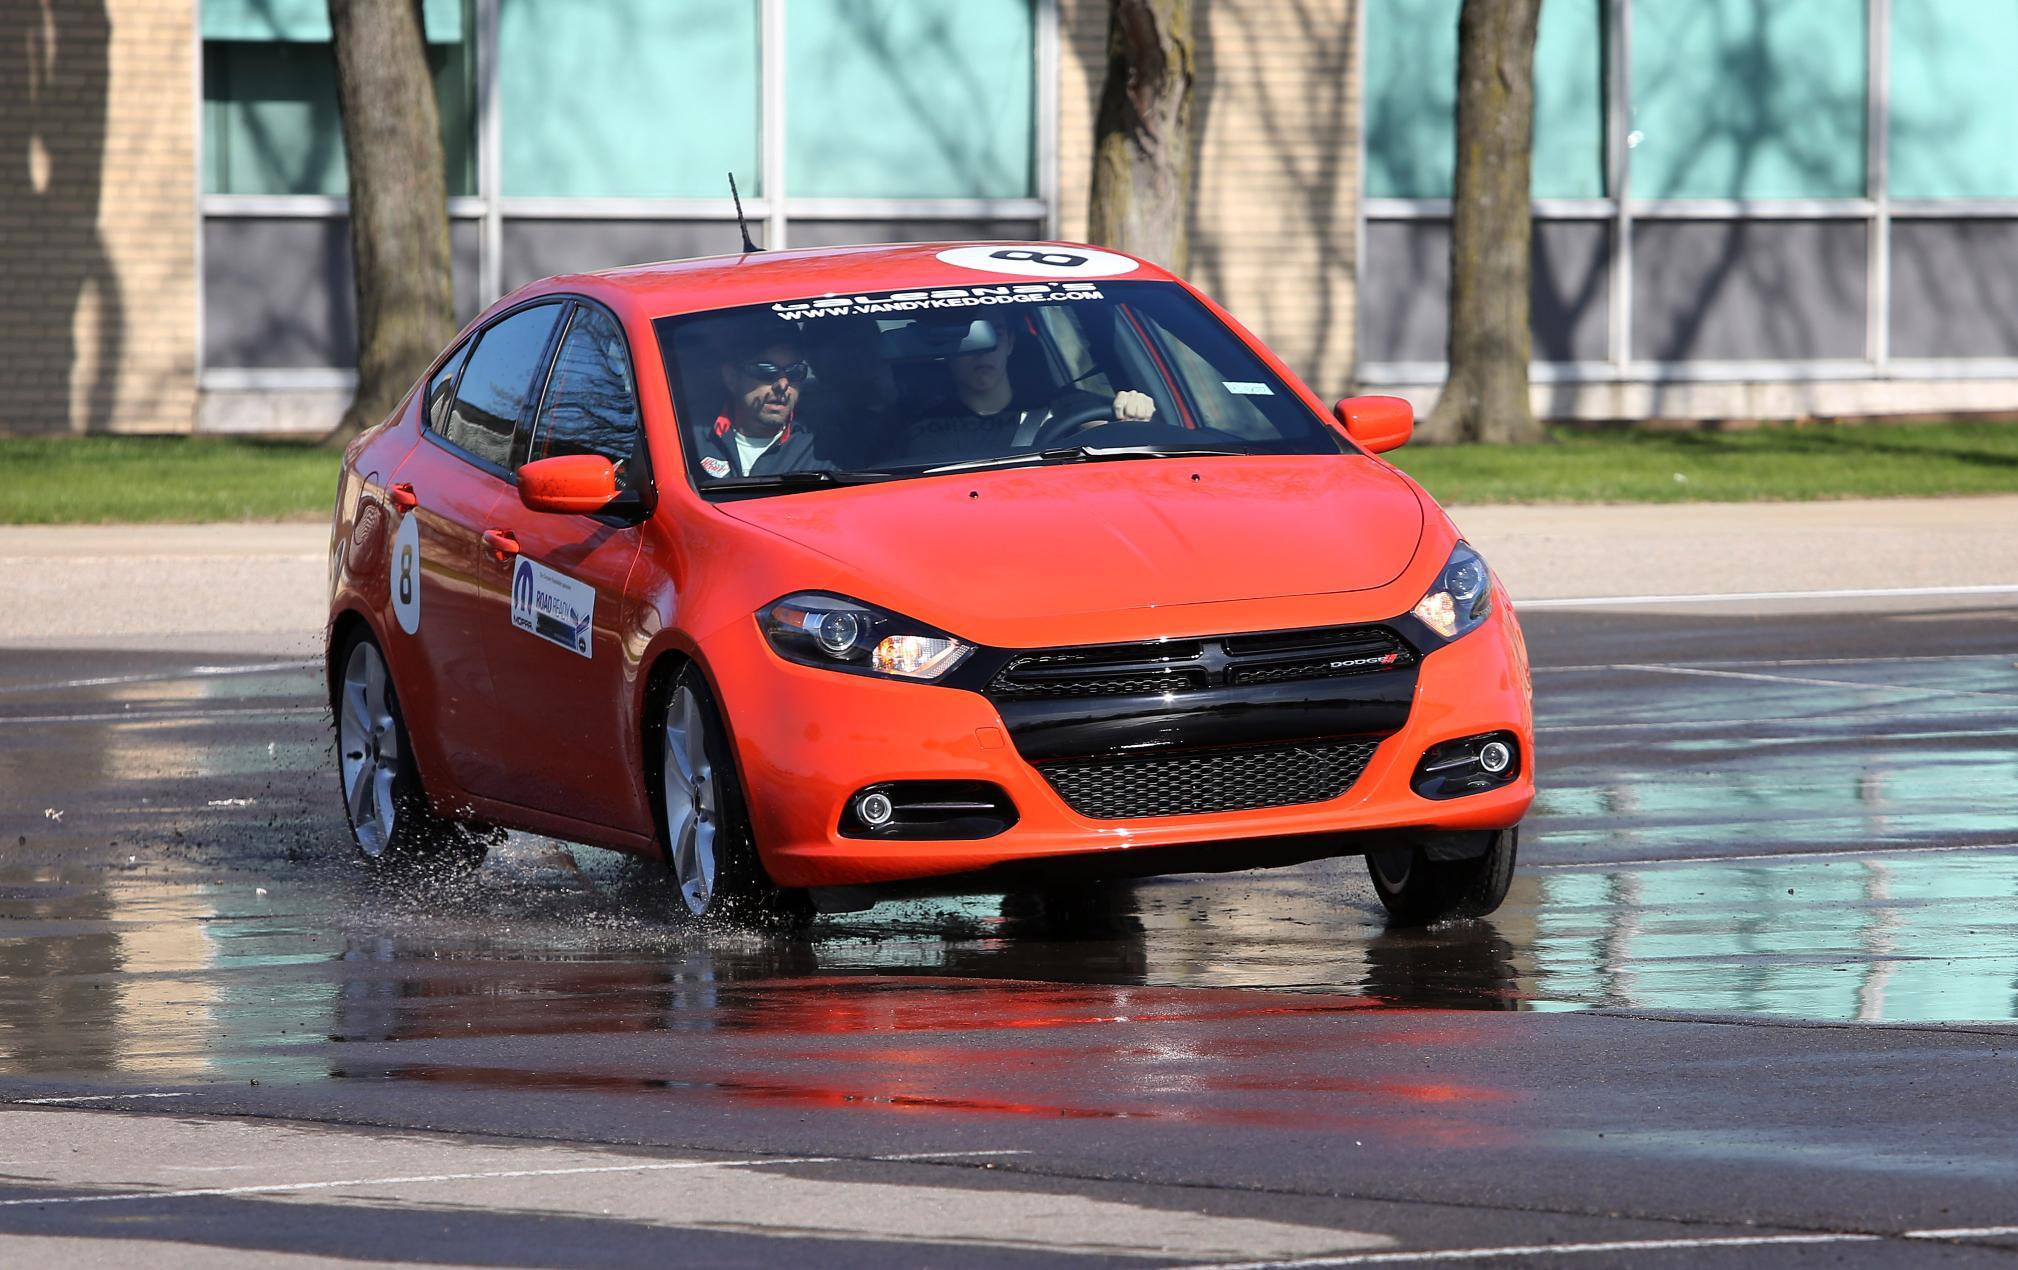 022416 CC Put the B.R.A.K.E.S. on your teen's driving habits 1